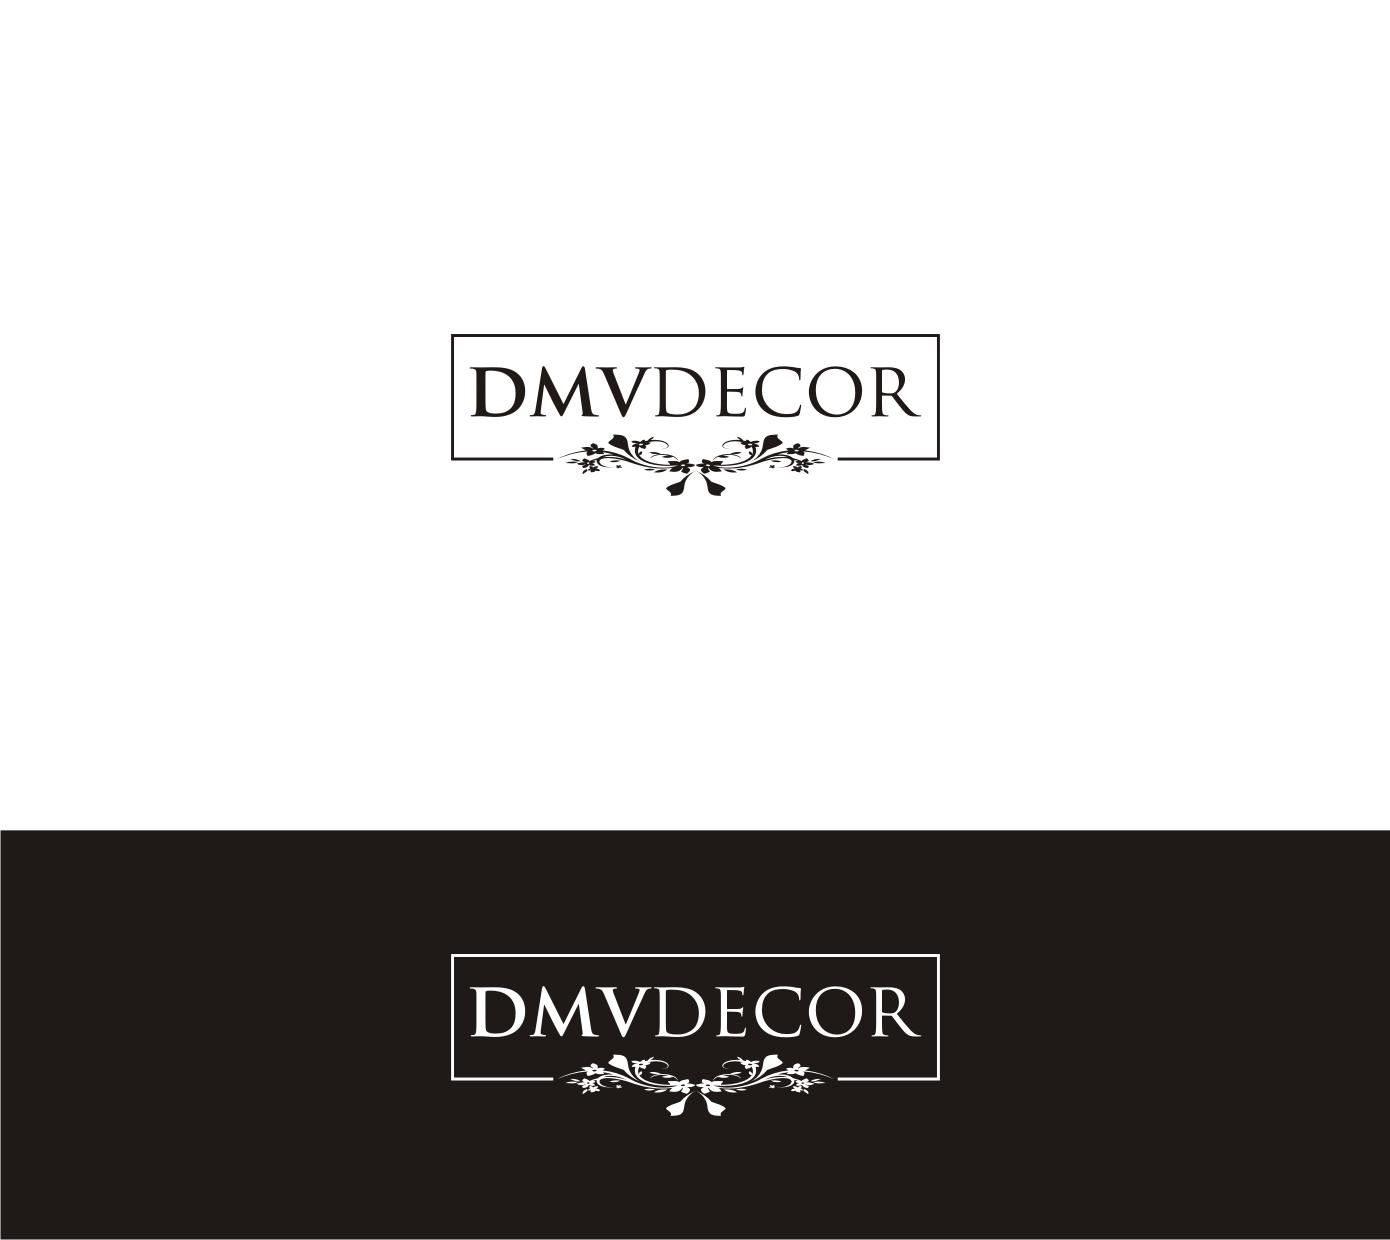 Logo Design by Sigitumarali Sigit - Entry No. 183 in the Logo Design Contest dmvdecor Logo Design.